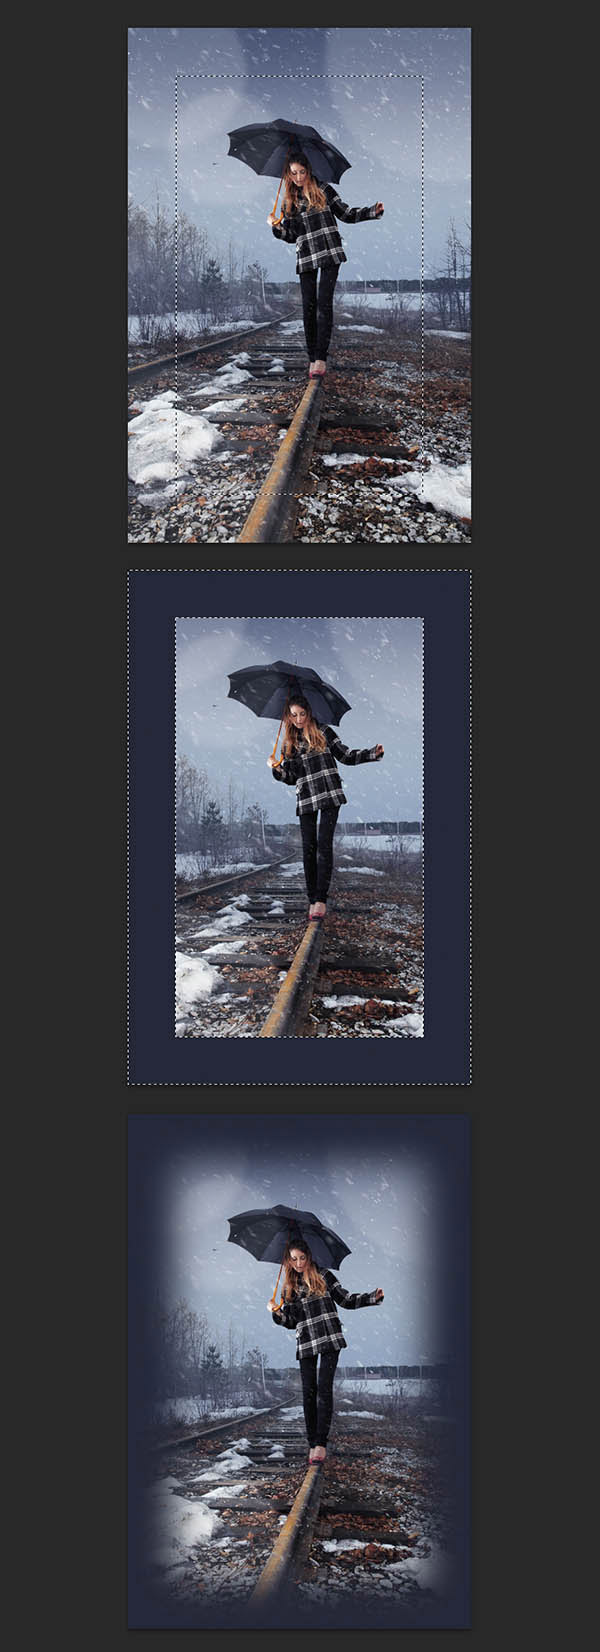 0947_Snow_9a-1.jpg